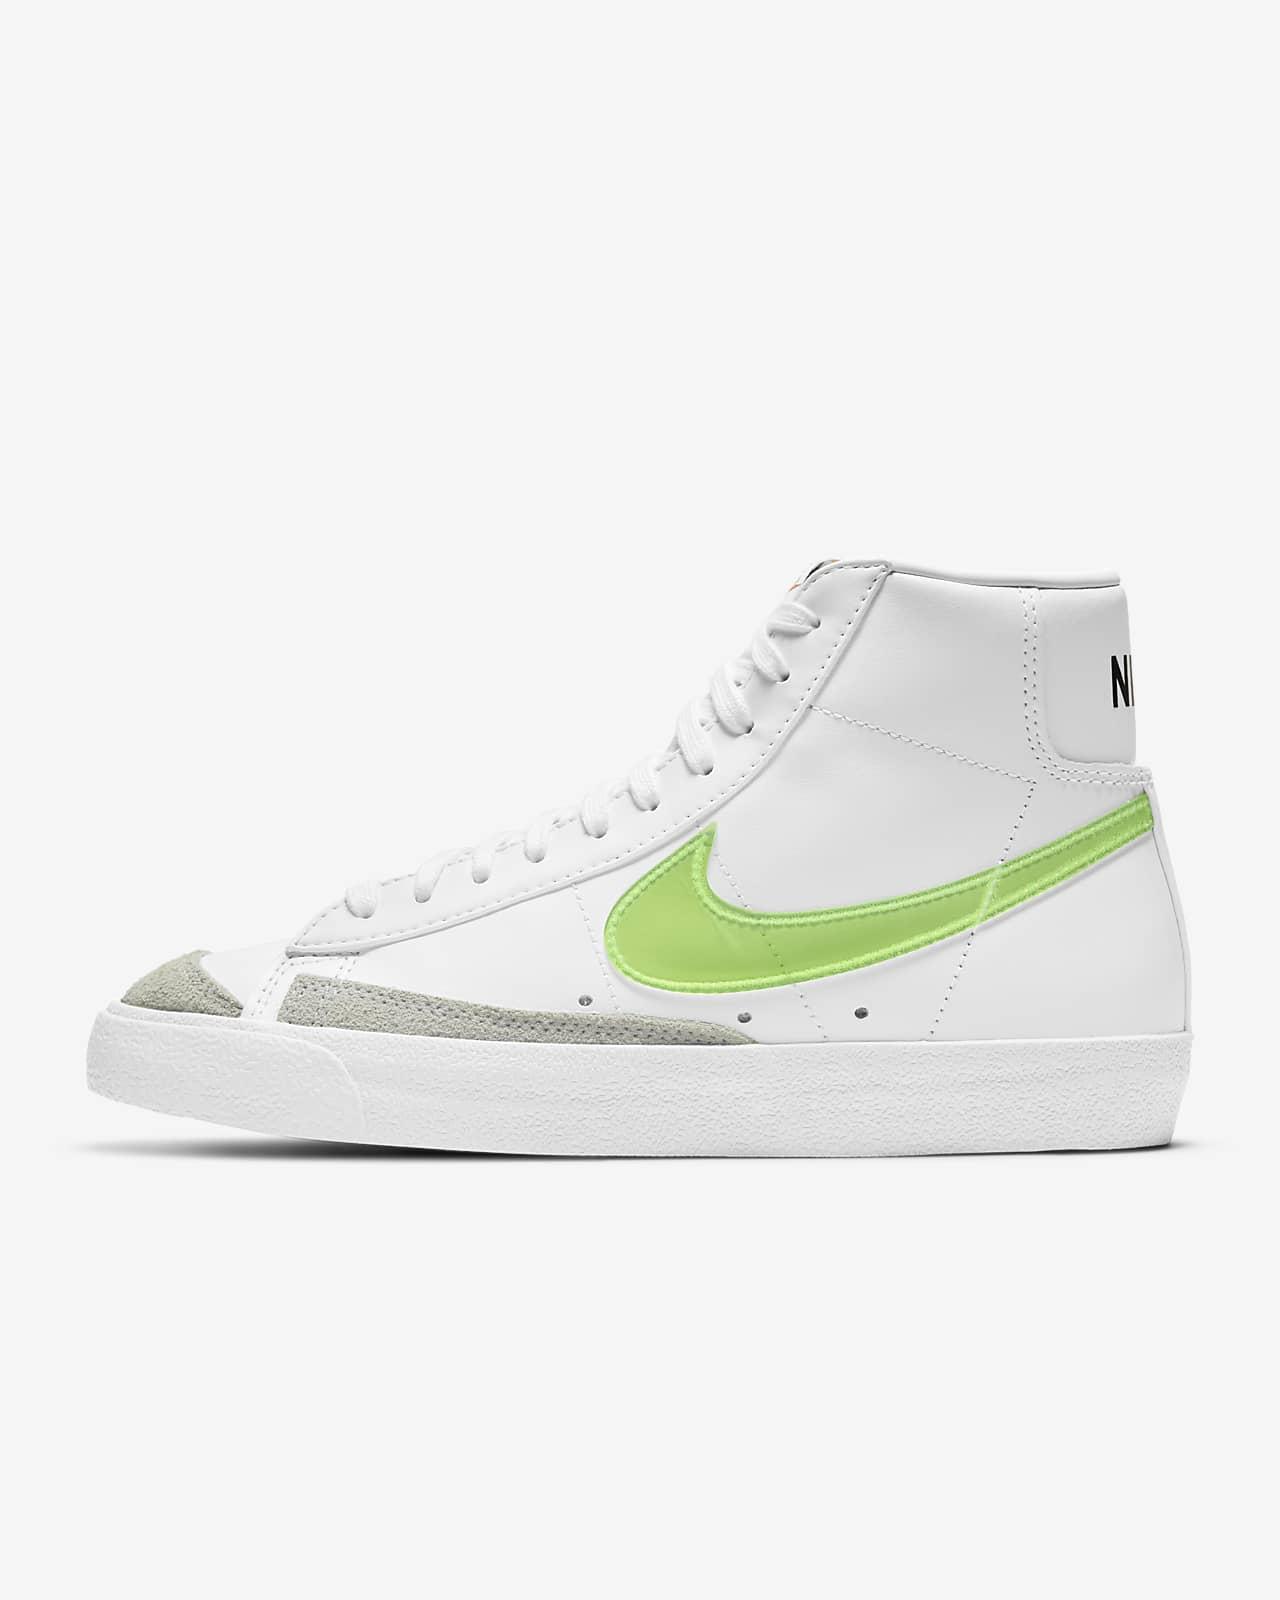 Chaussure Nike Blazer Mid '77 Essential pour Femme